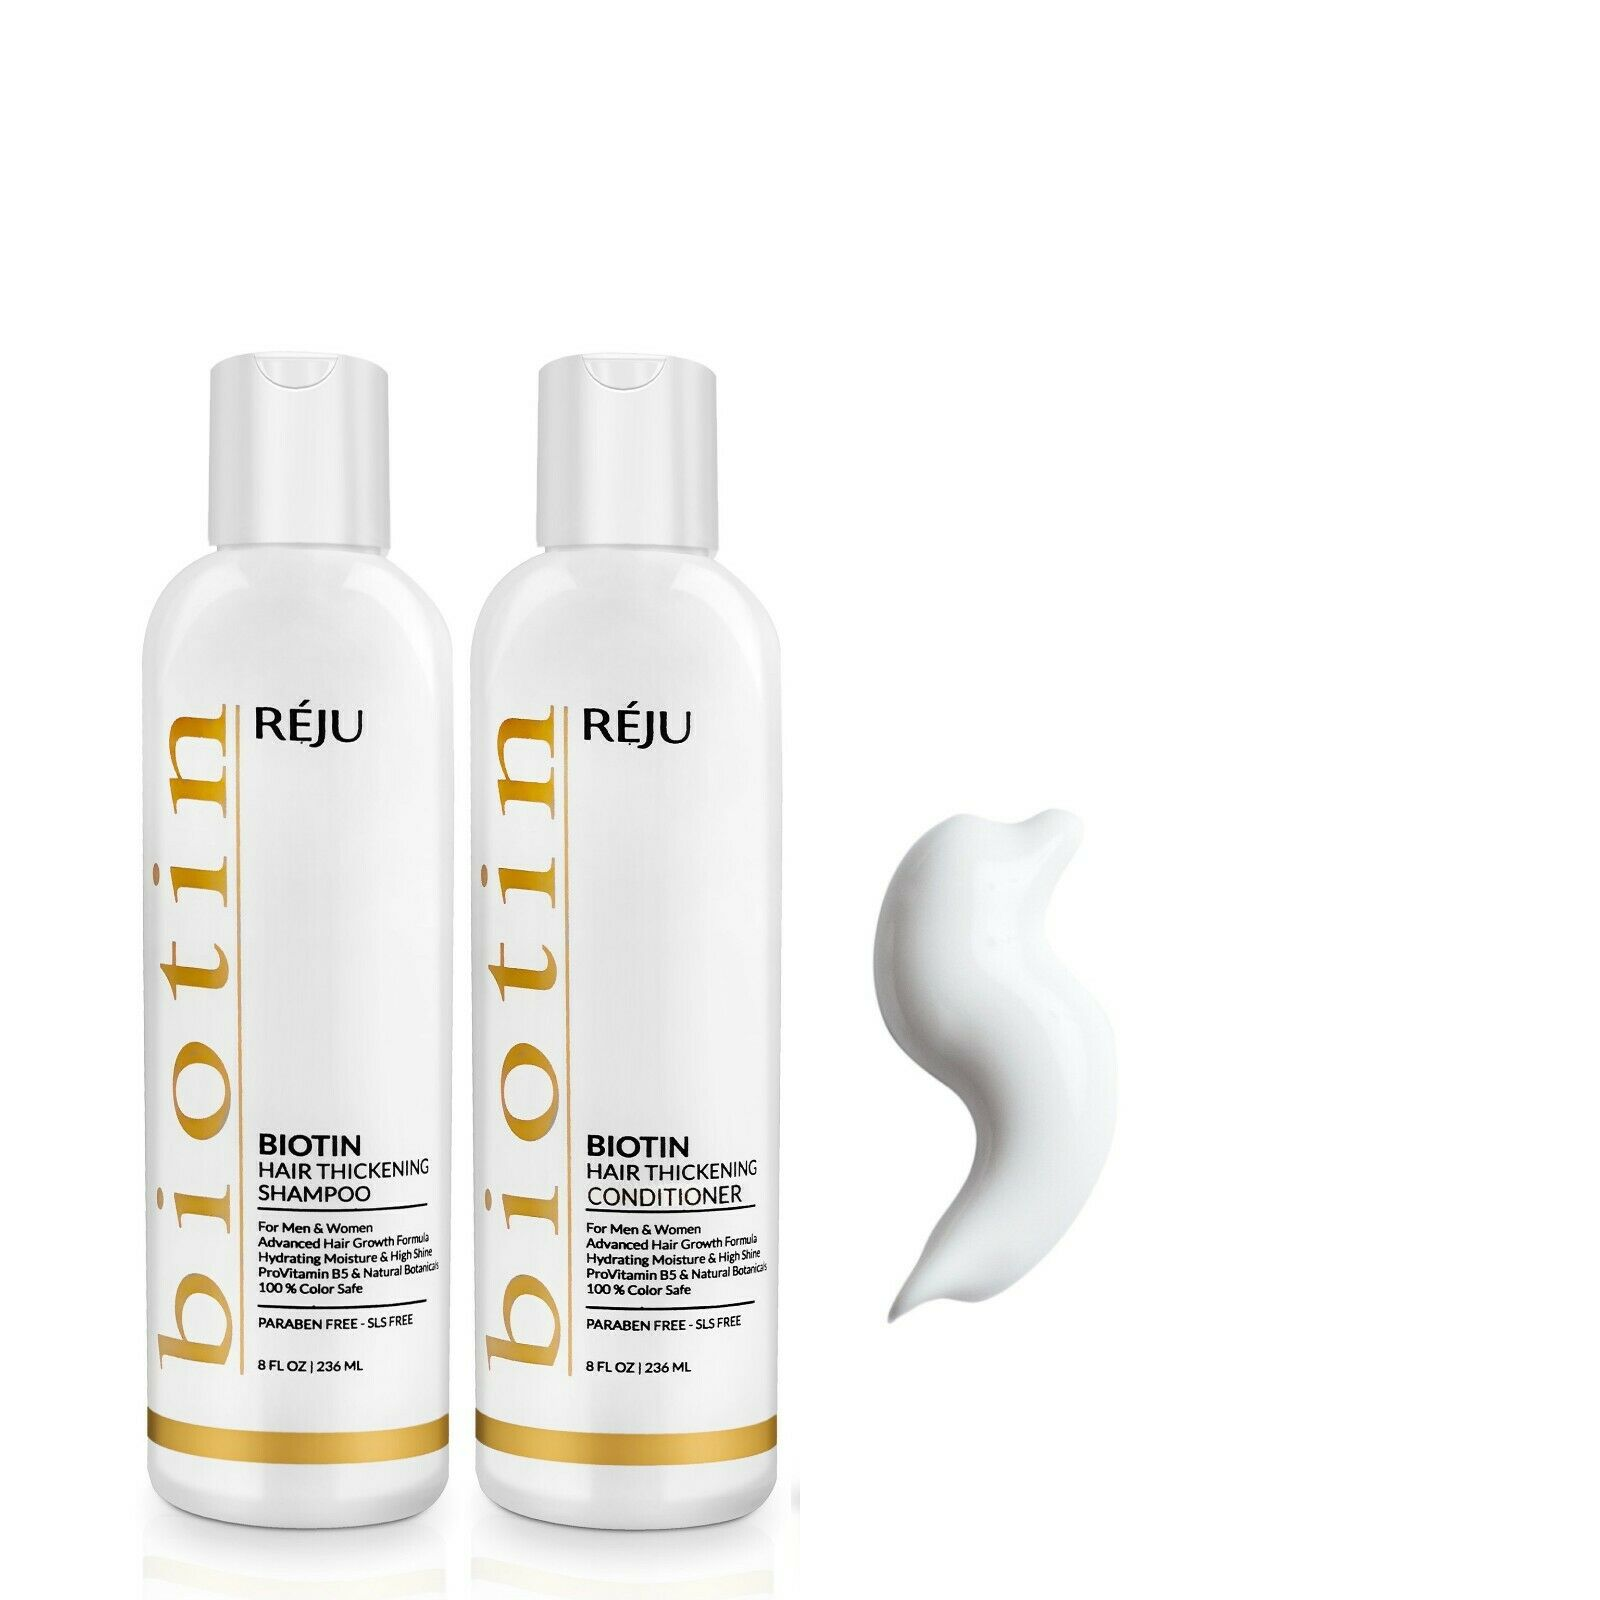 Natural Biotin Shampoo & Conditioner For Hair Growth & Hair